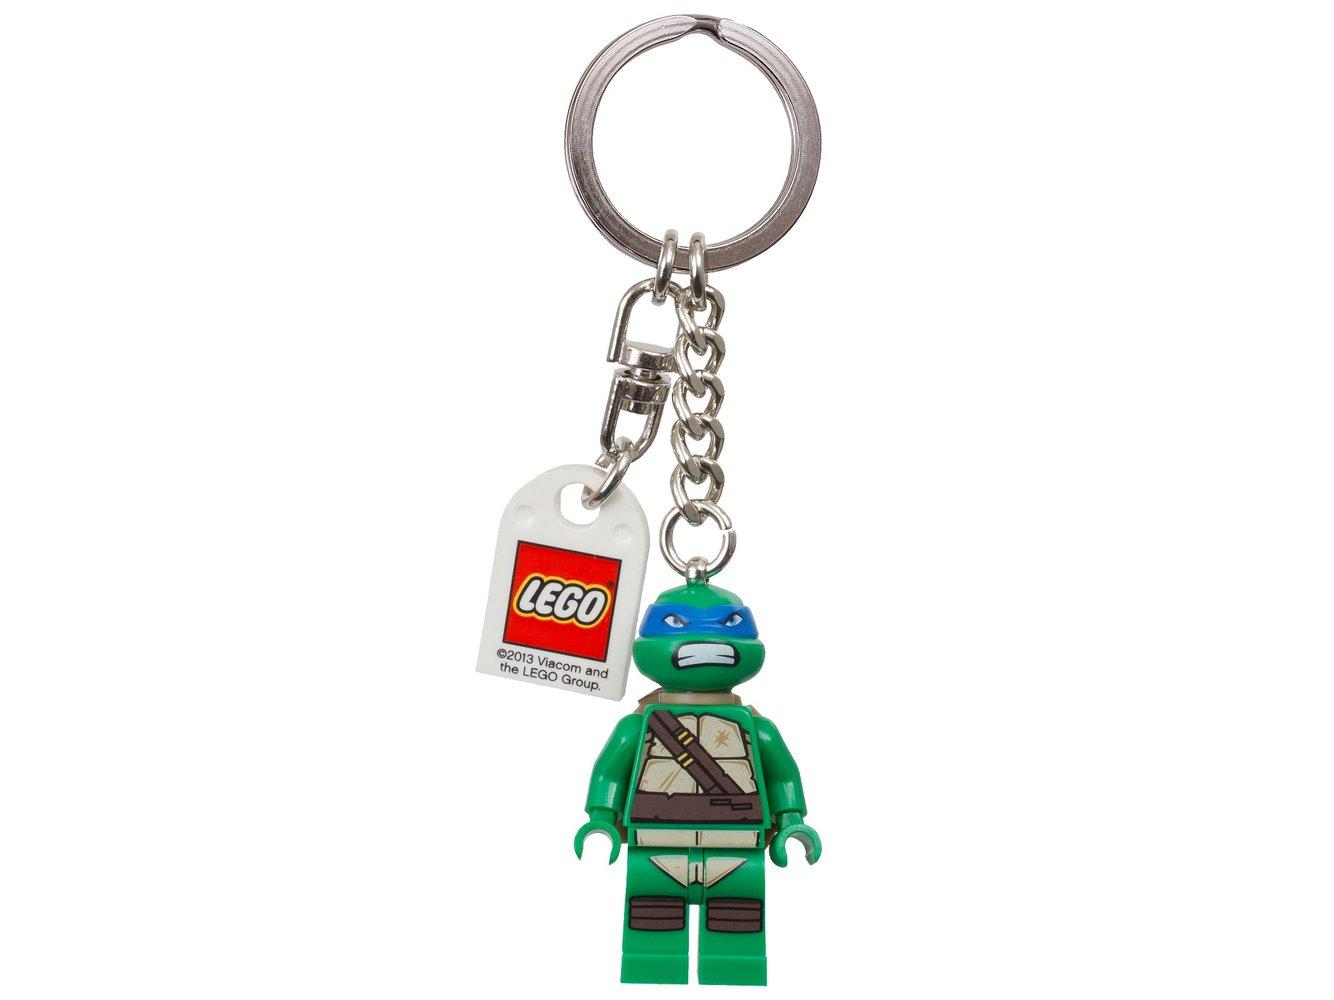 Leonardo Key Chain